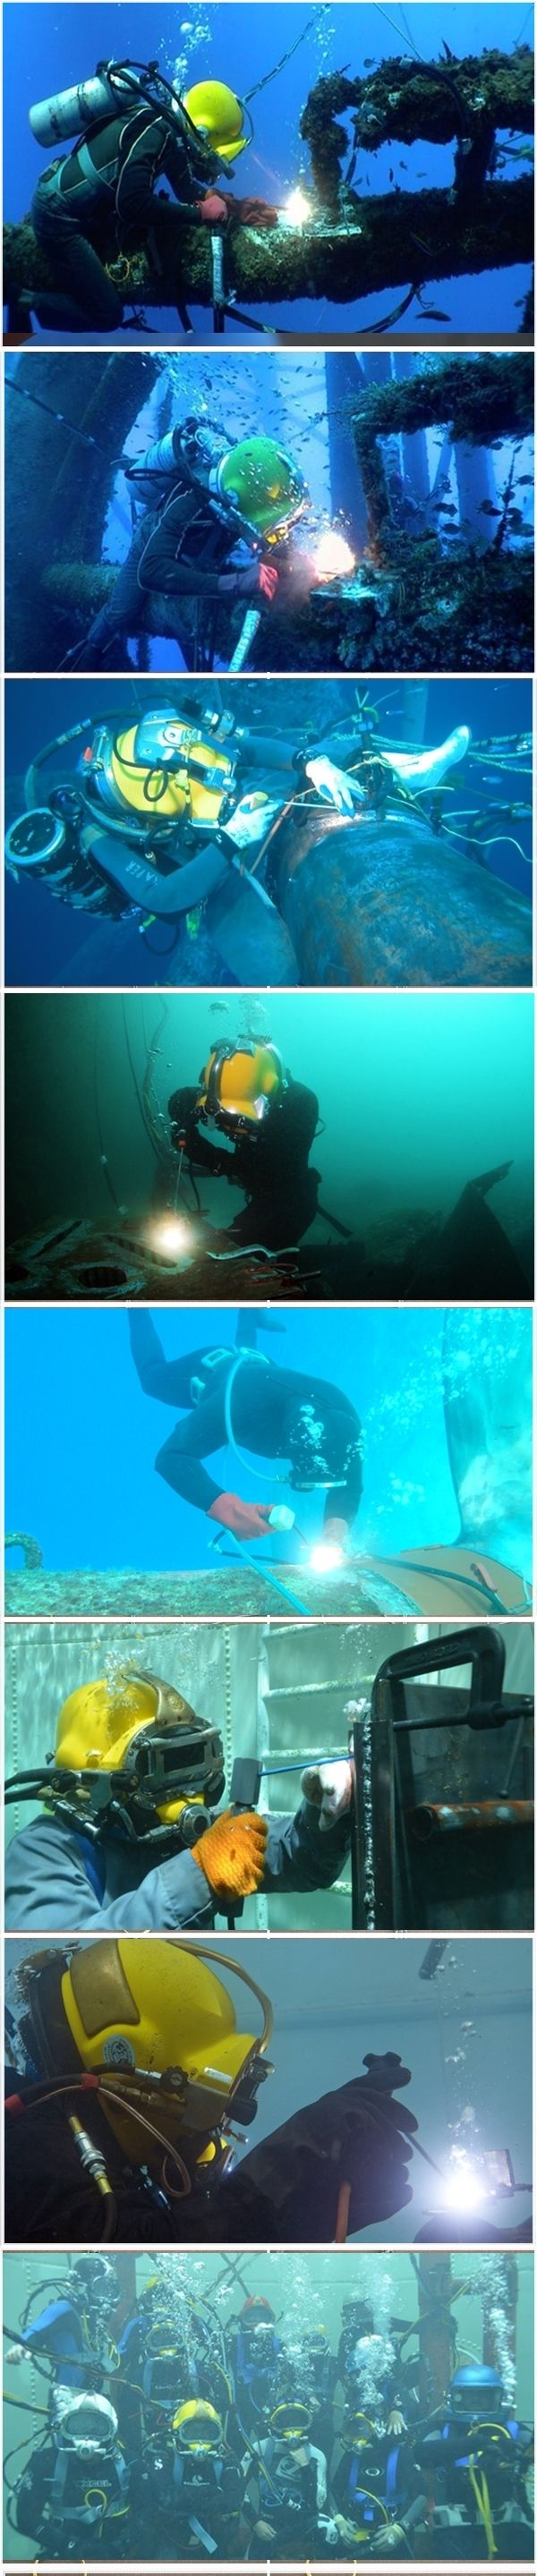 Underwater wet welding - Making welds inside water. Best picture compilation for scuba welding.